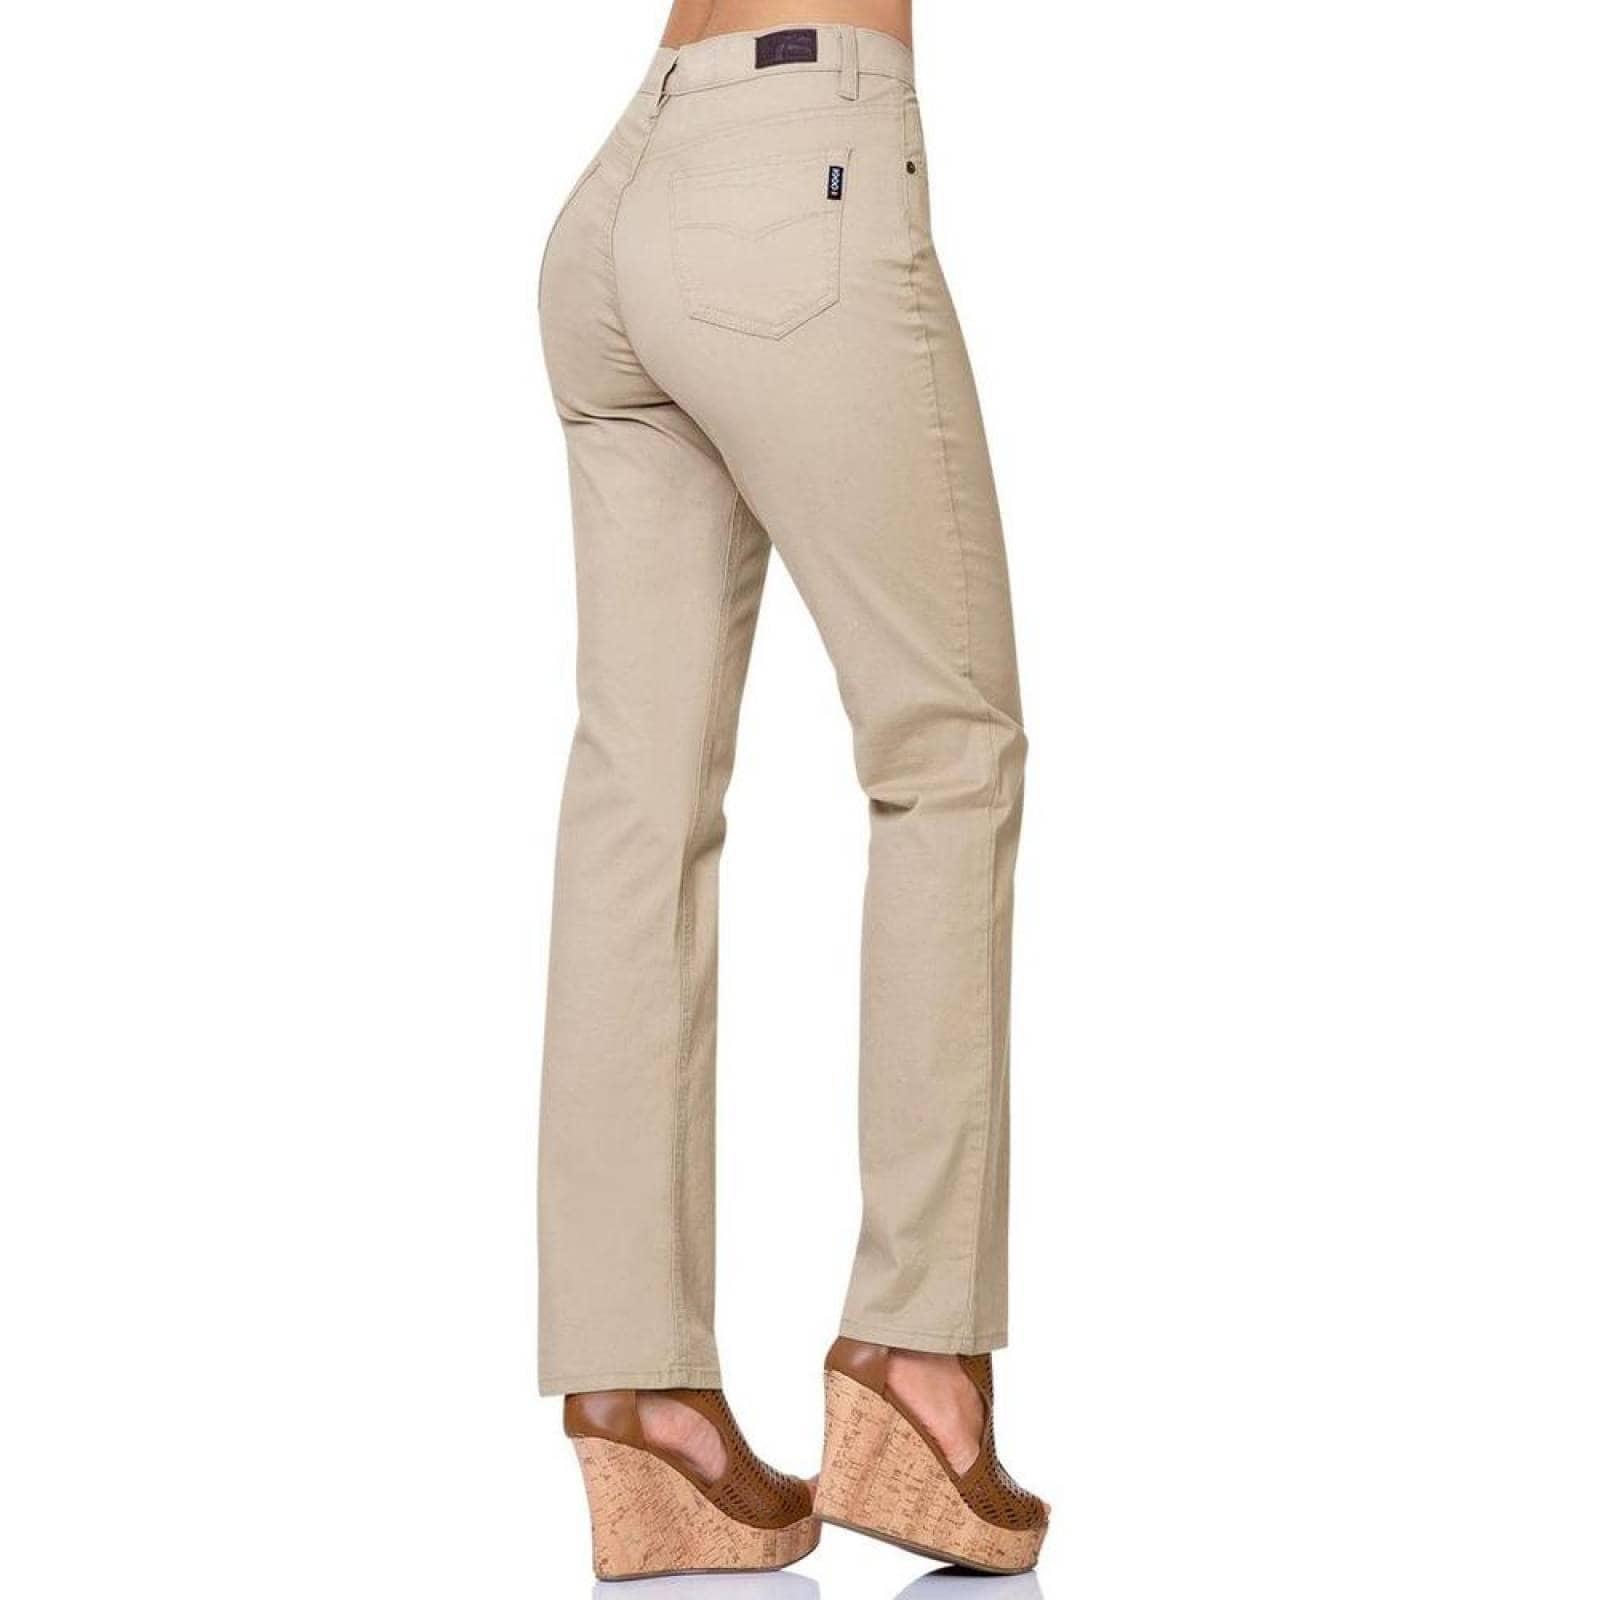 Pantalon Casual Mujer Oggi Khaki 59102049 Gabardina Stretch